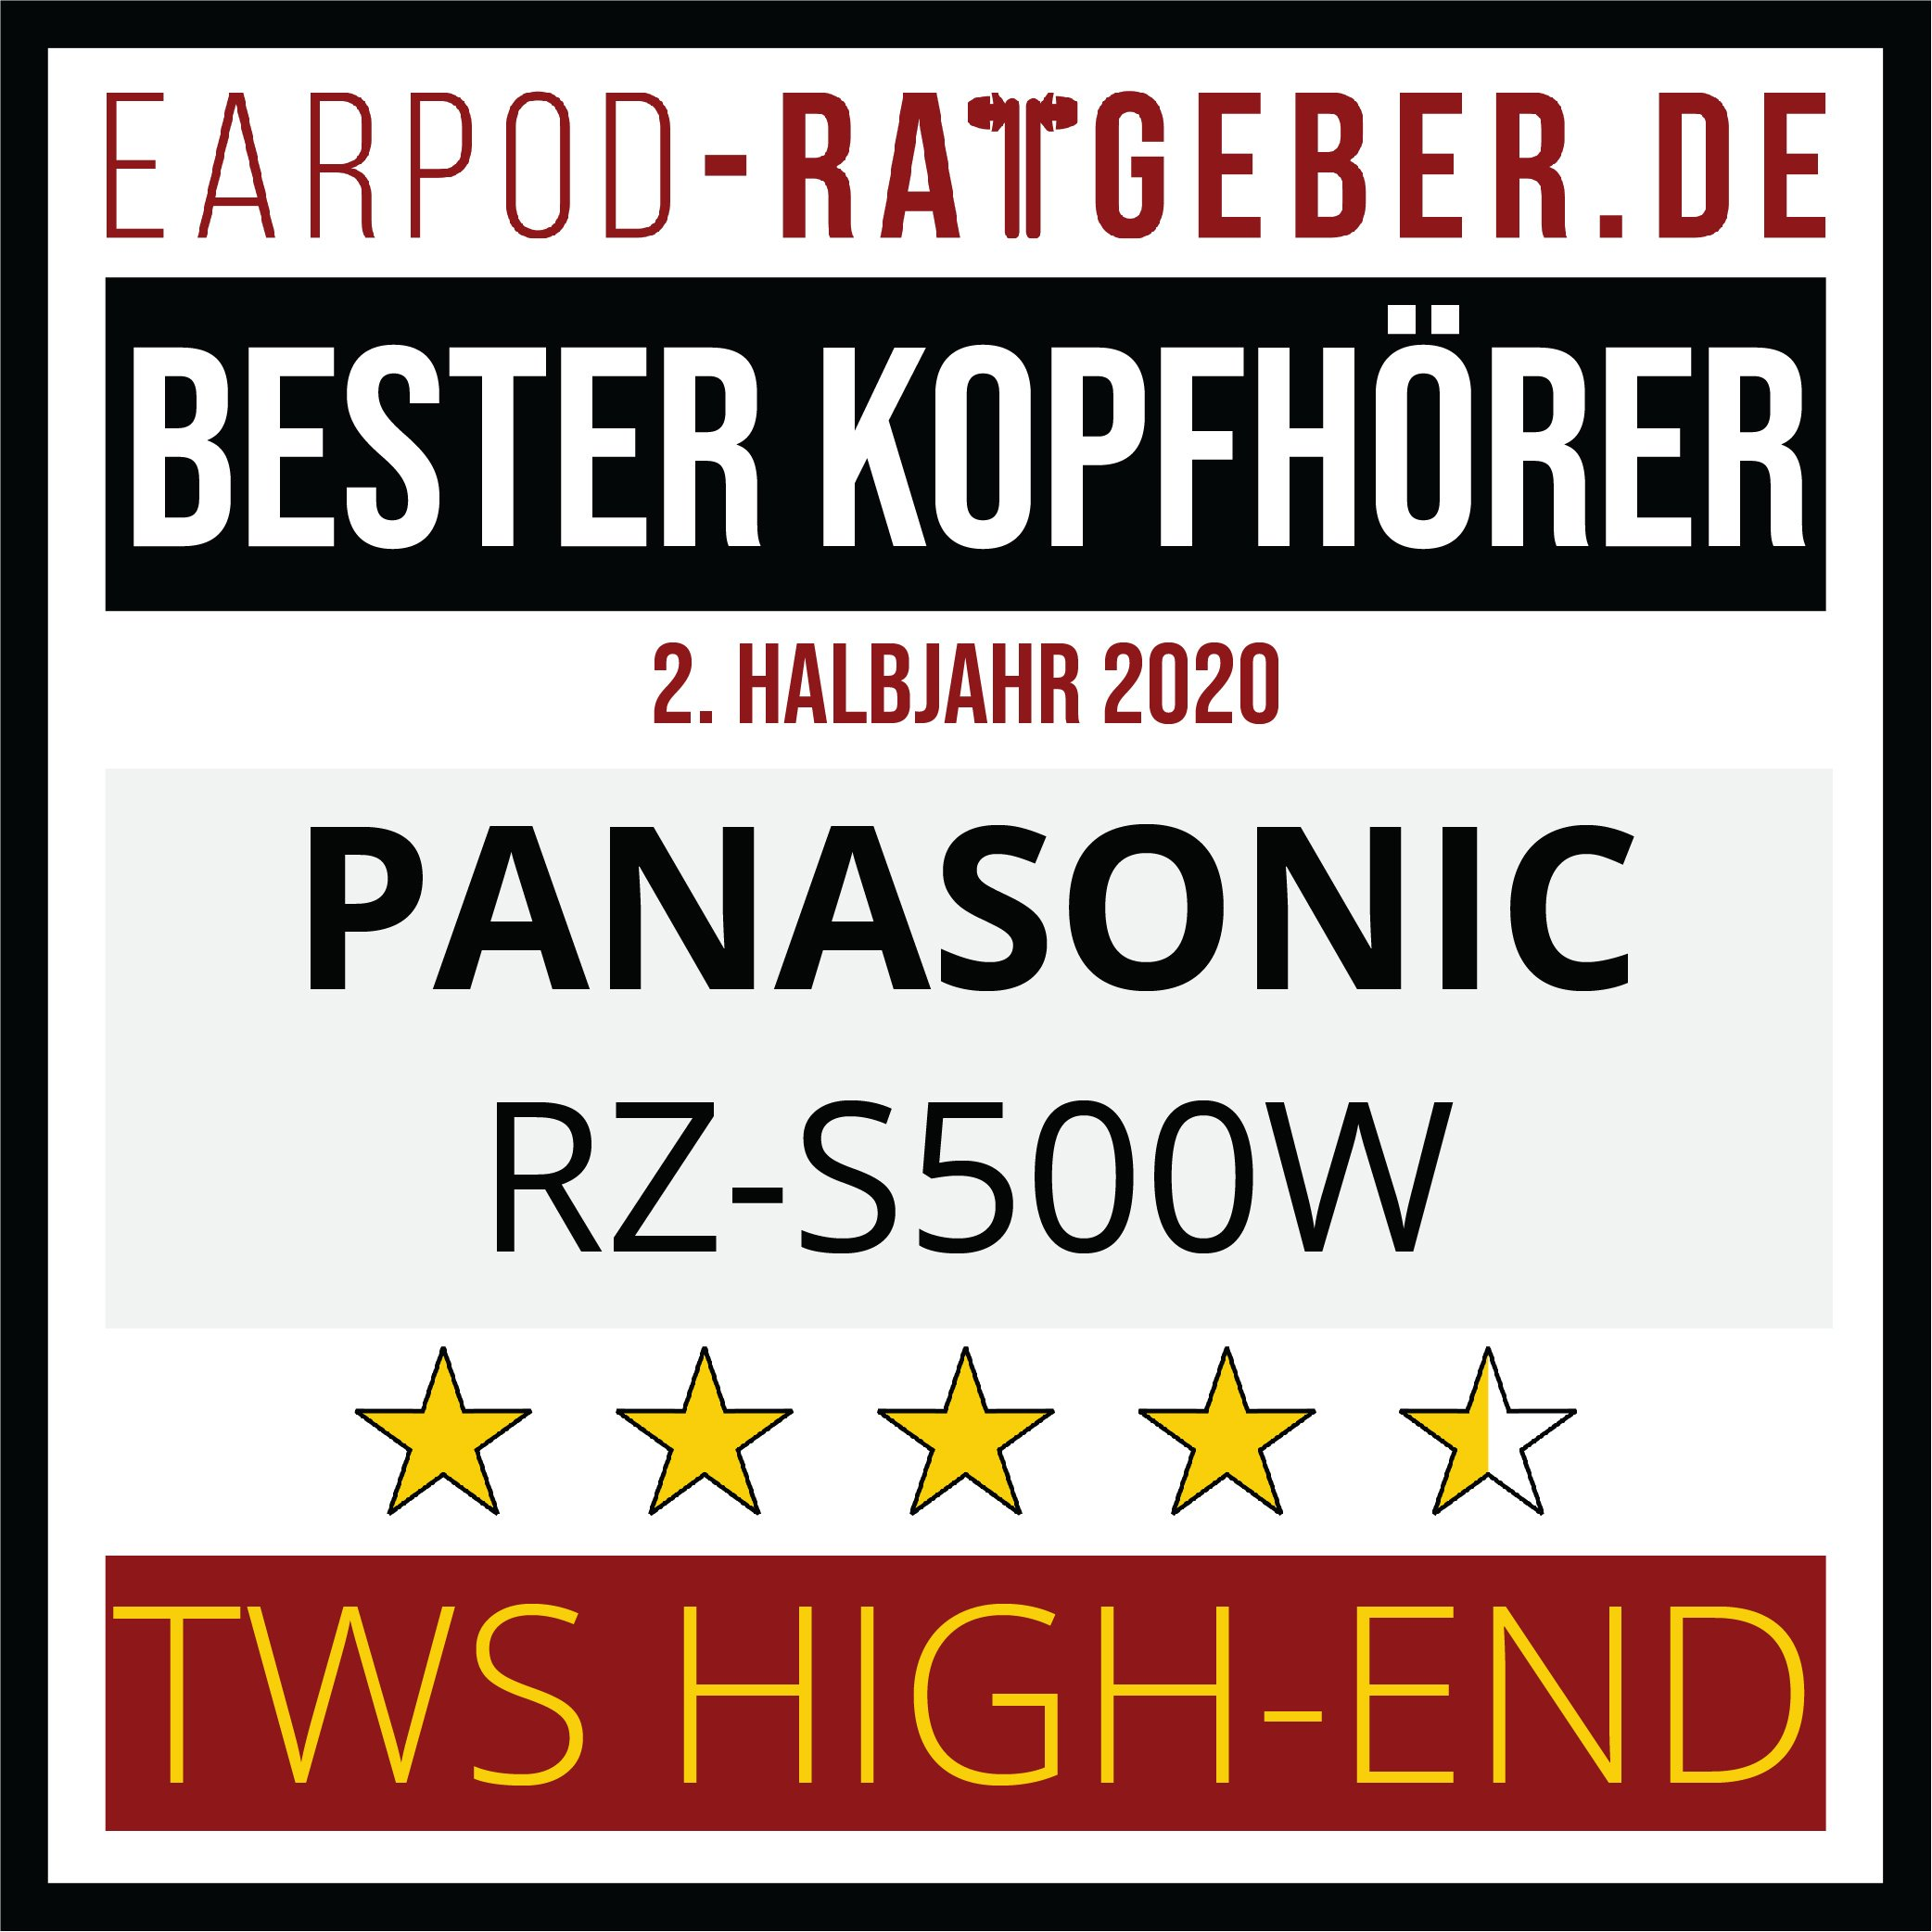 Die besten Kopfhörer 2020 Earpod-Ratgeber.de Awards Einsteiger Panasonic 2.hj